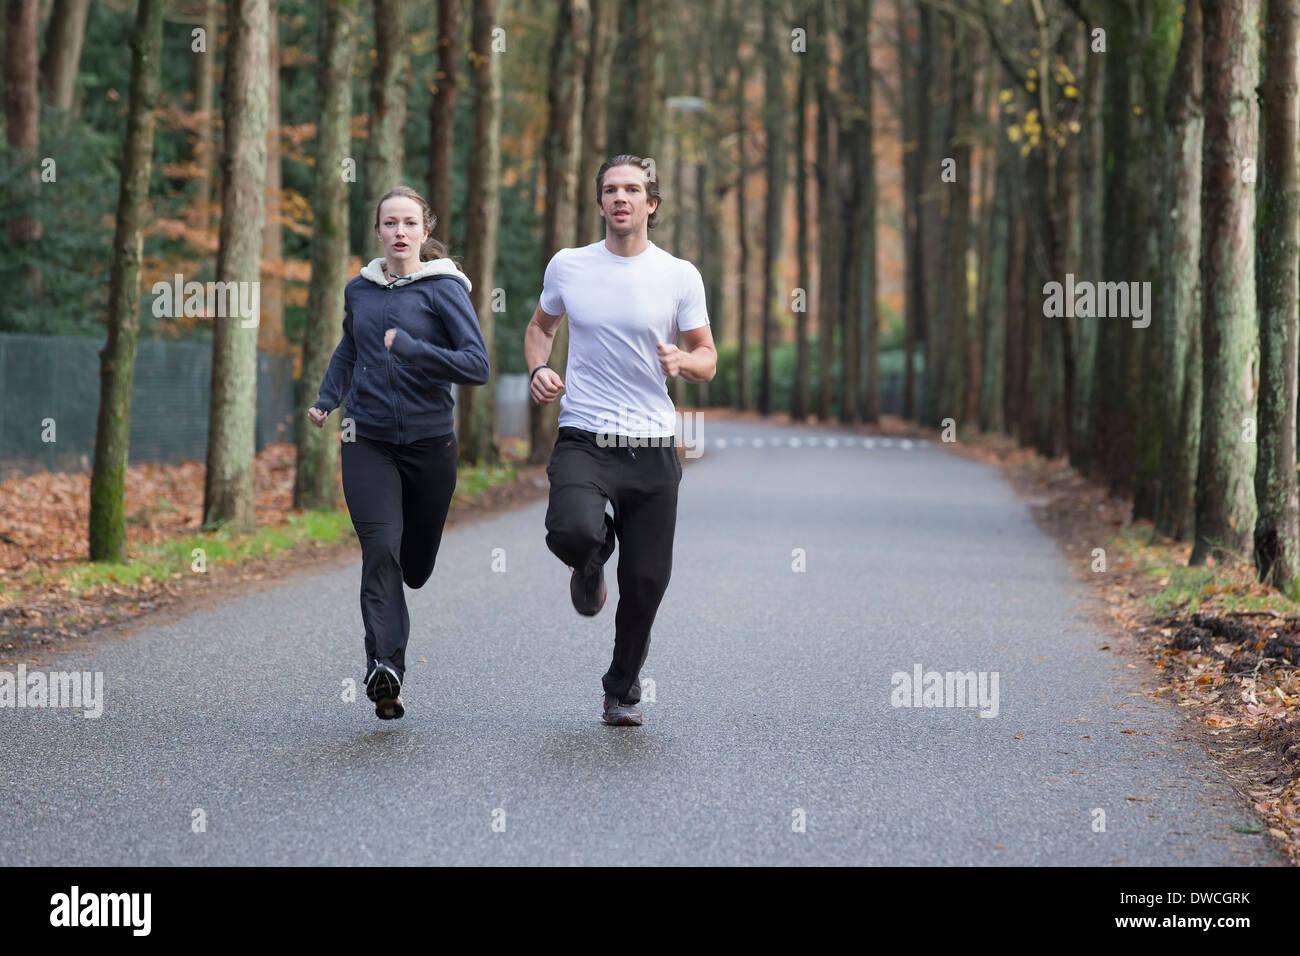 Par corriendo a través del bosque Imagen De Stock